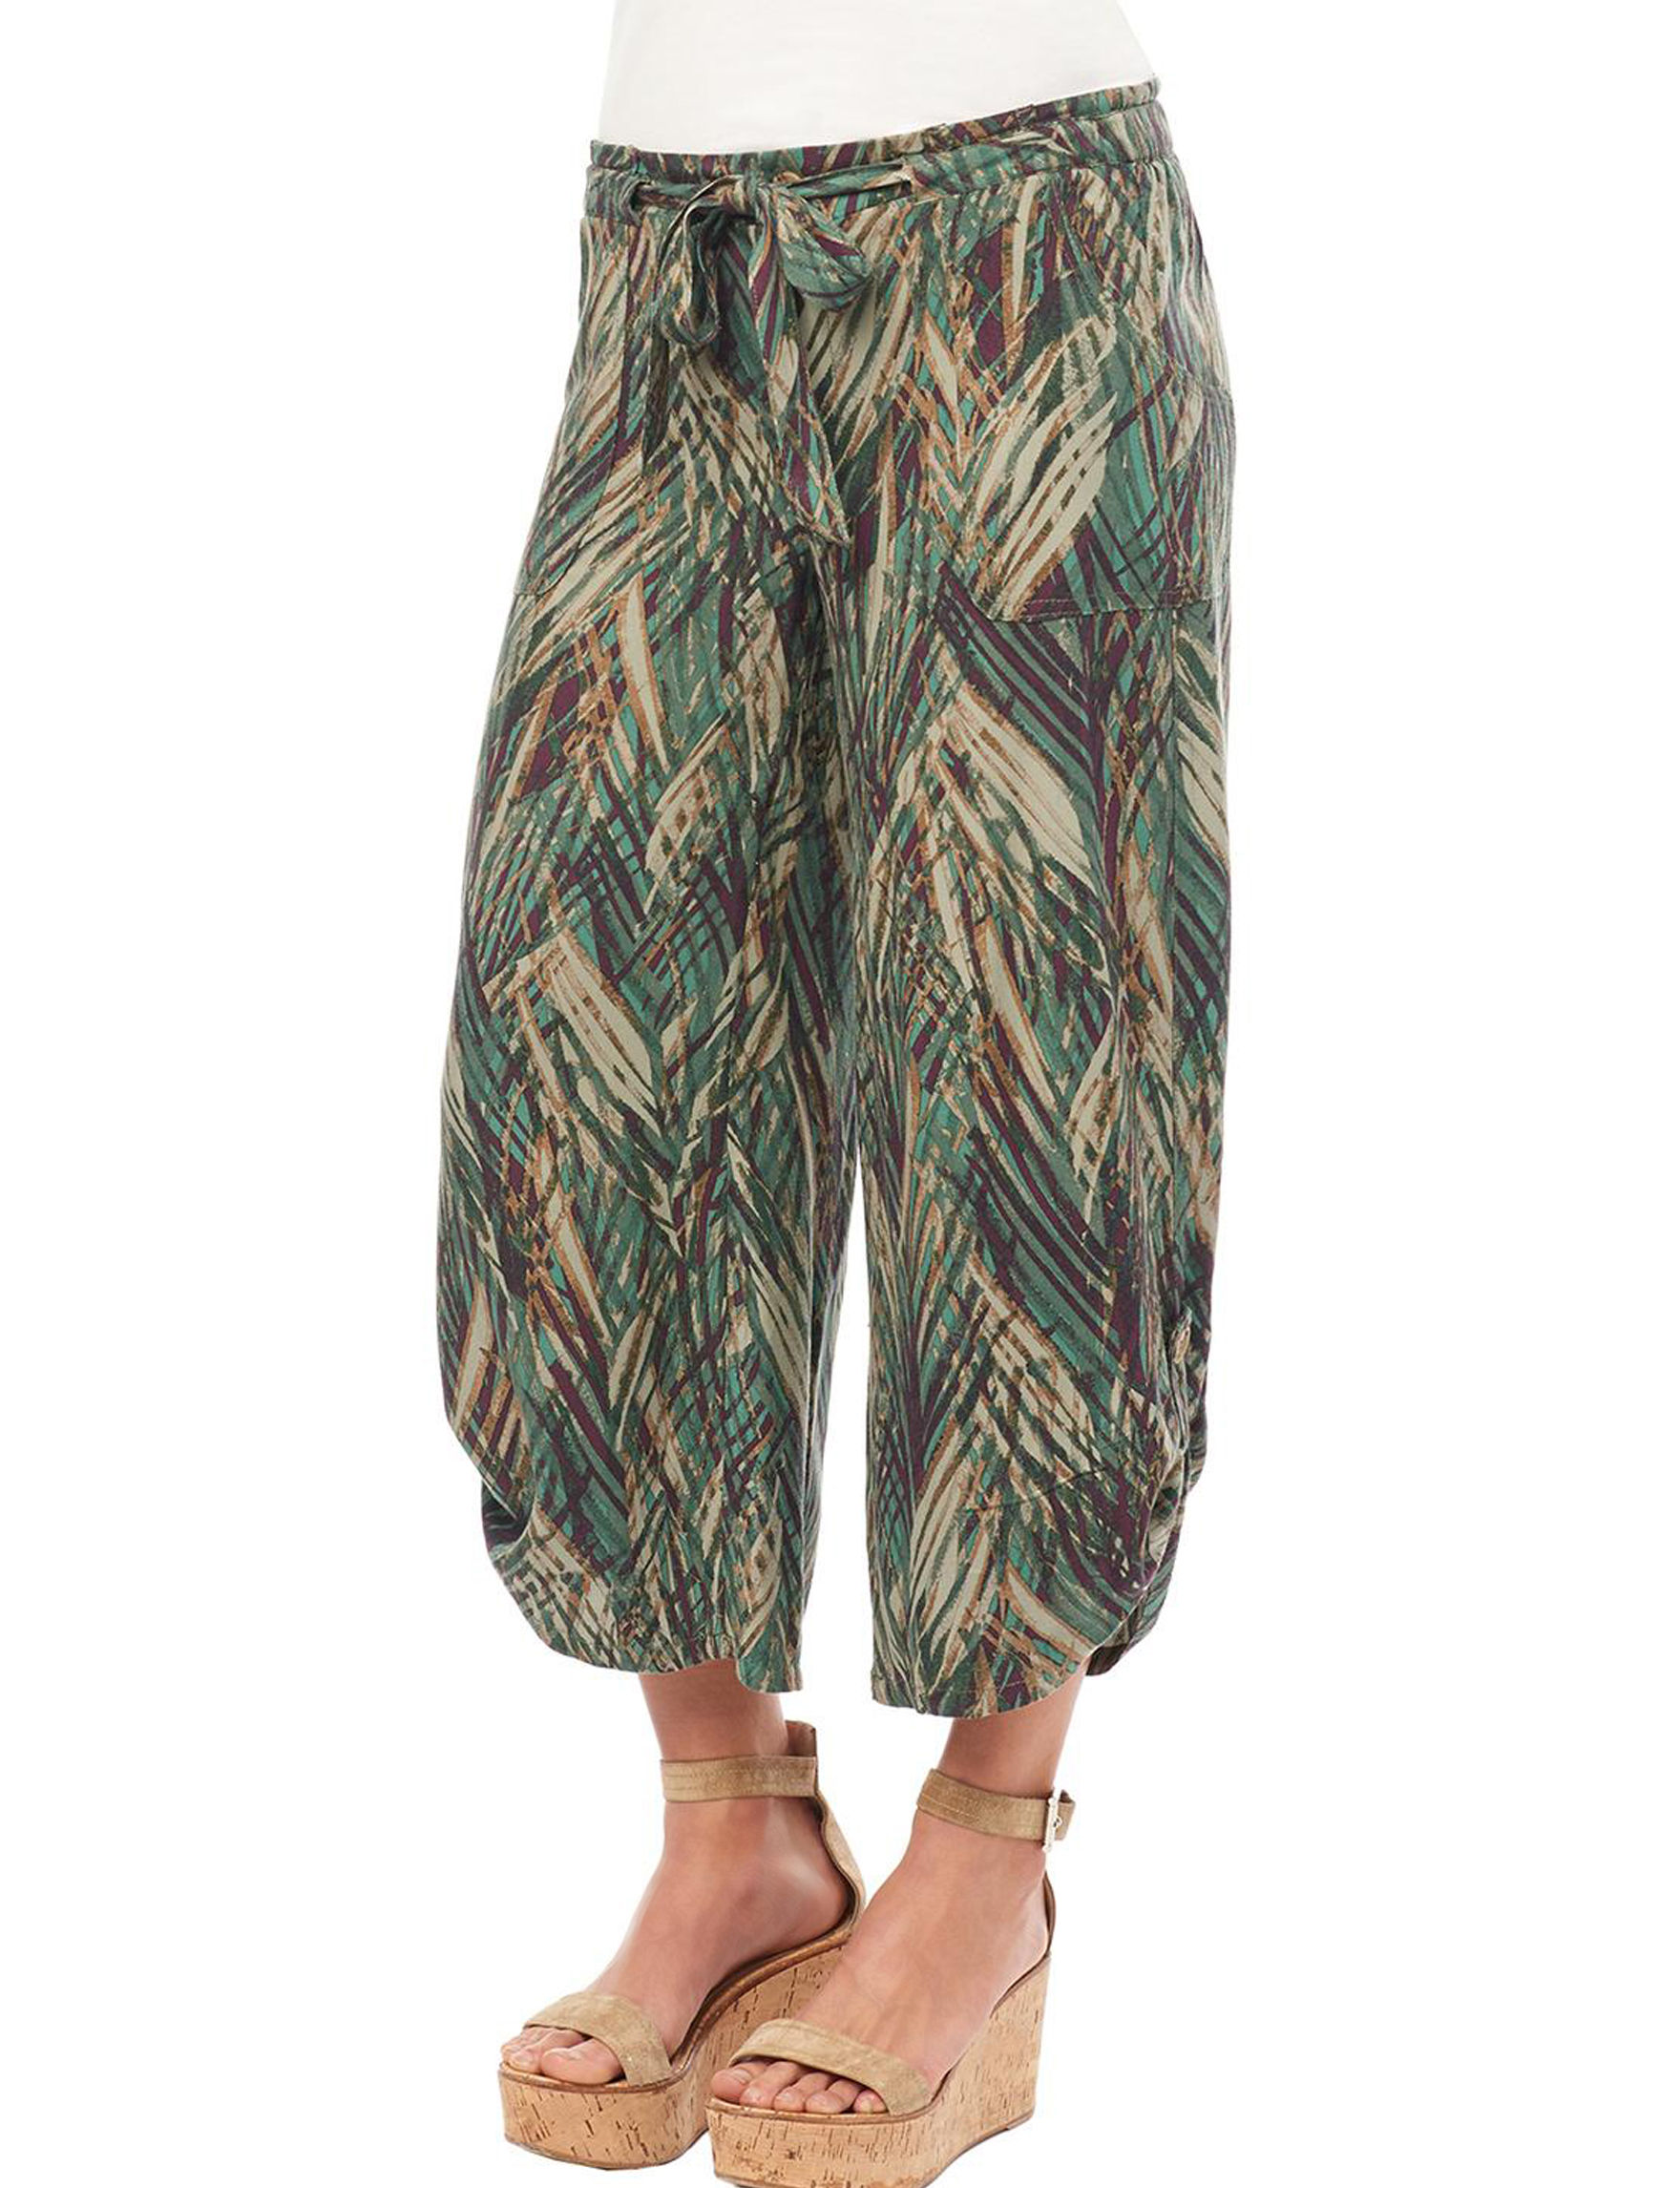 Democracy Olive Capris & Crops Soft Pants